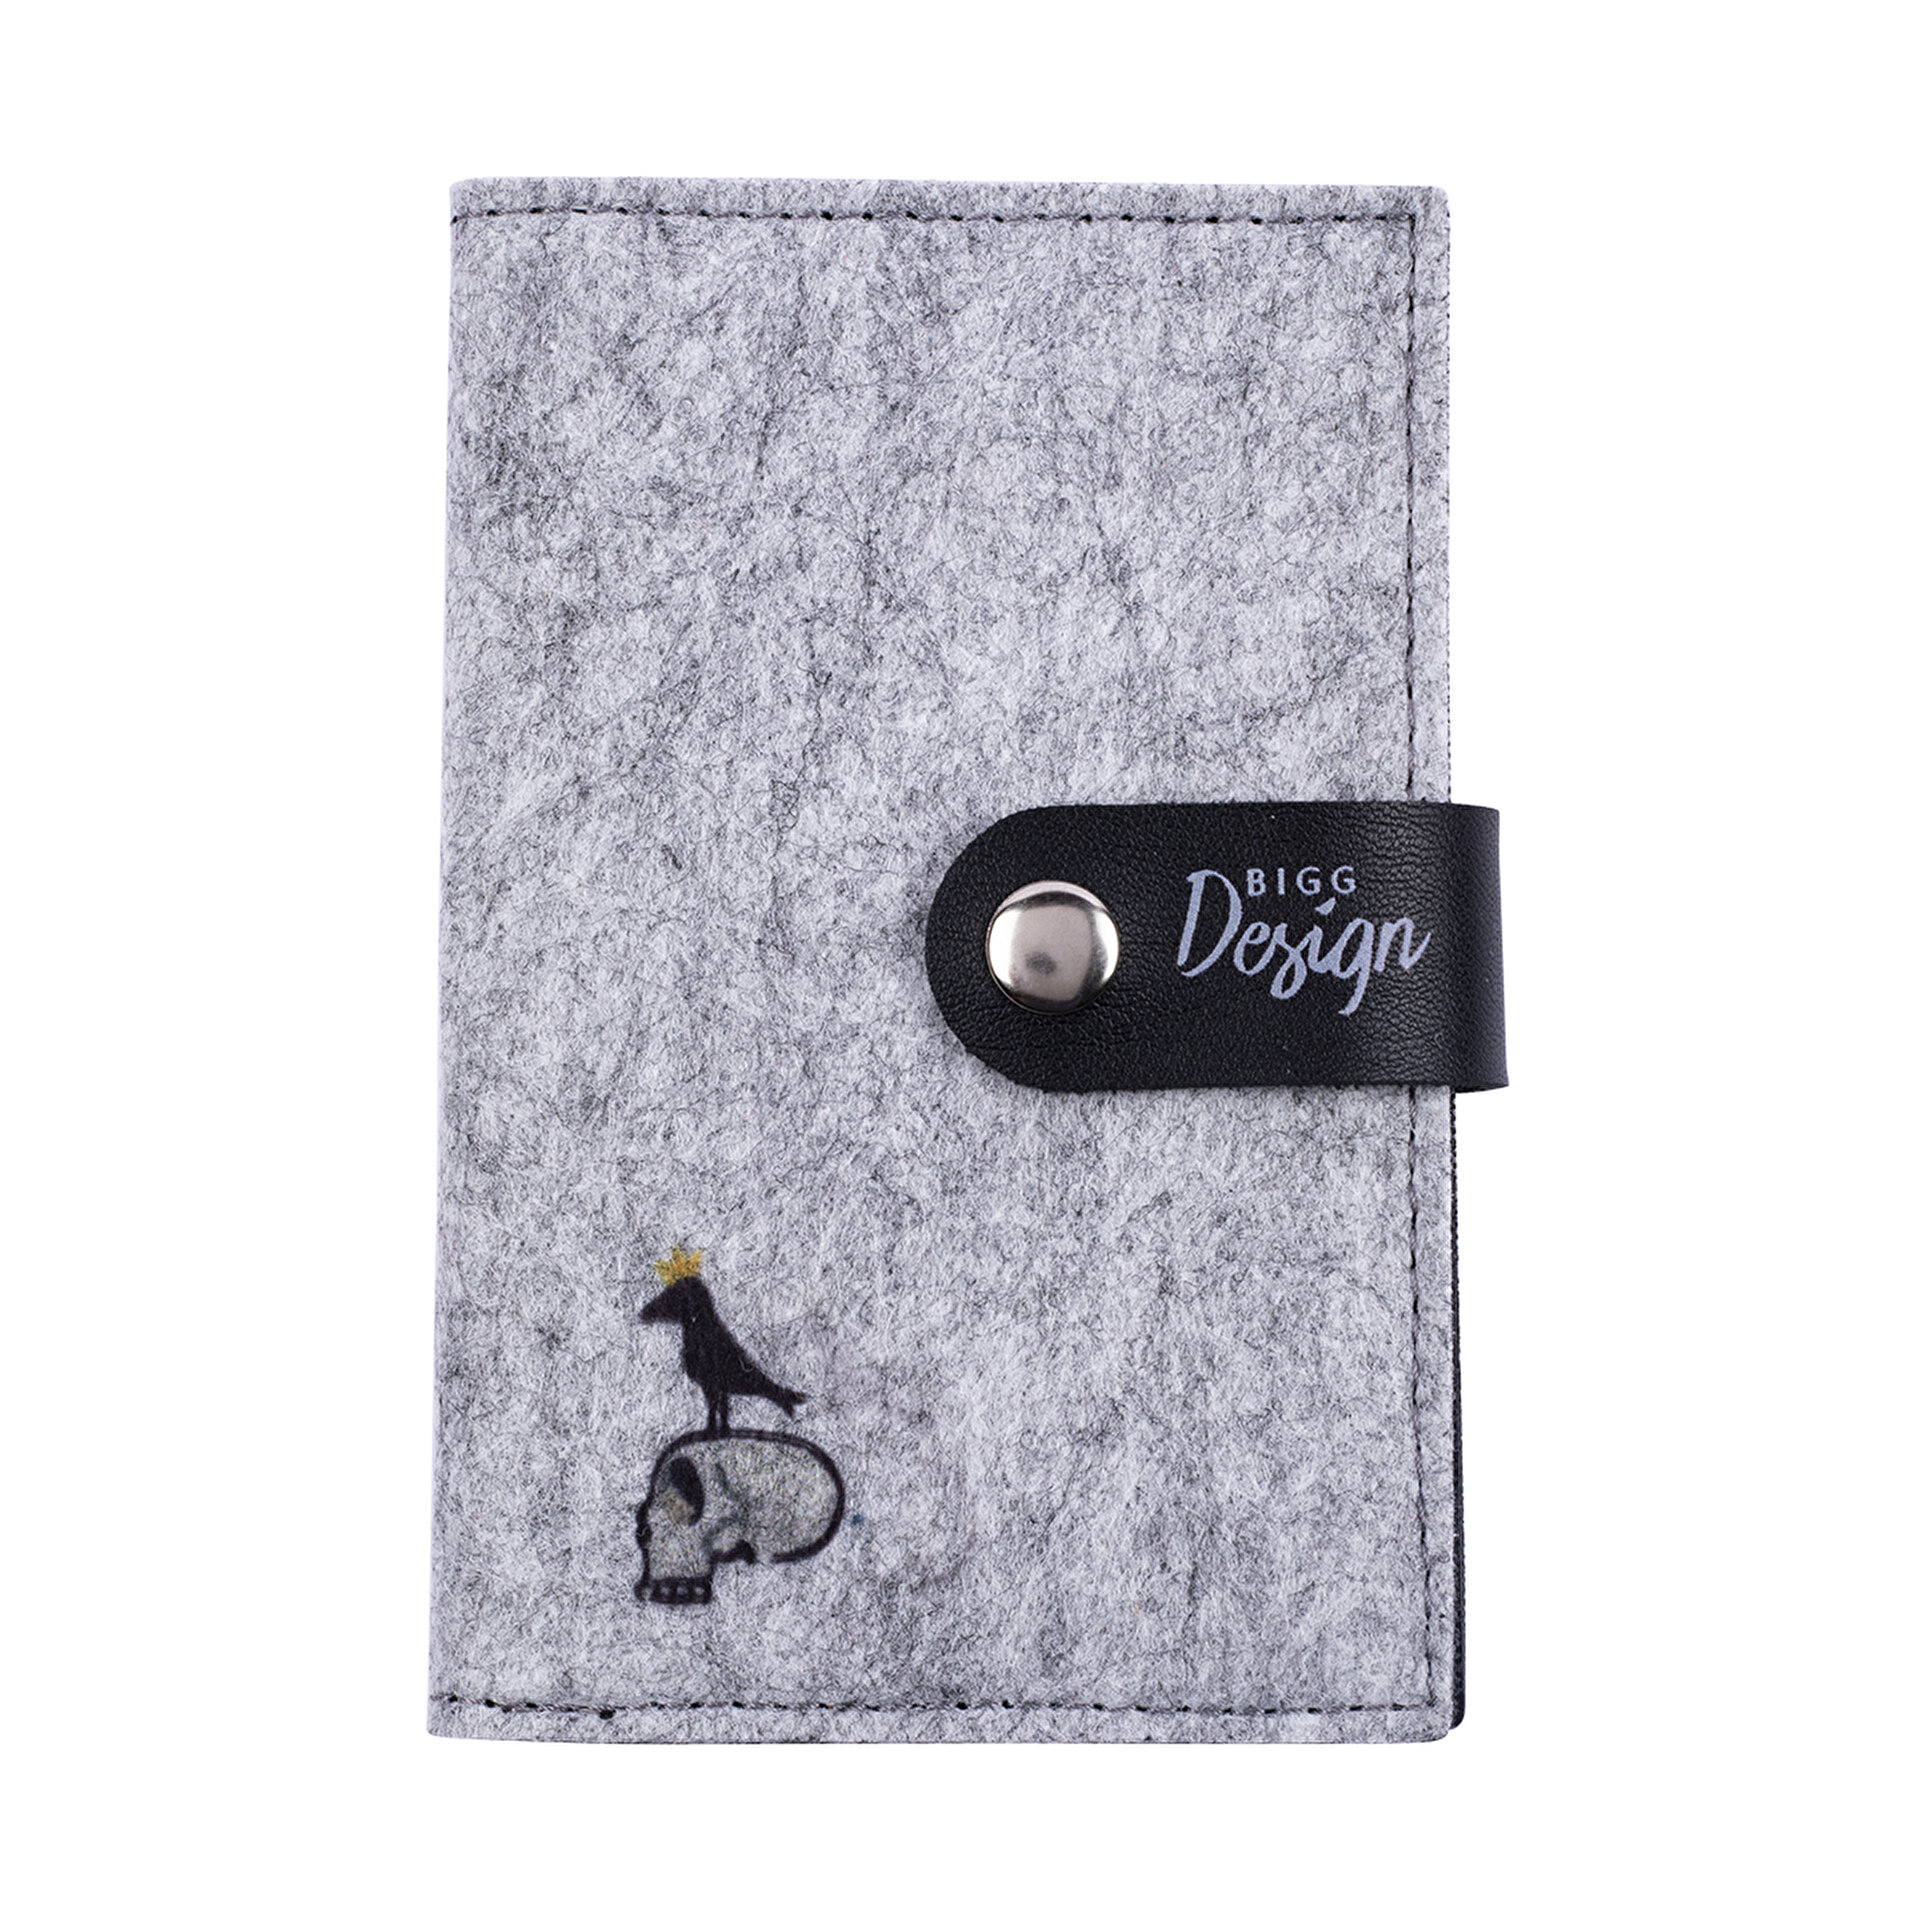 Picture of BiggDesign Mr. Allright Man Keçe Pasaport Kabı